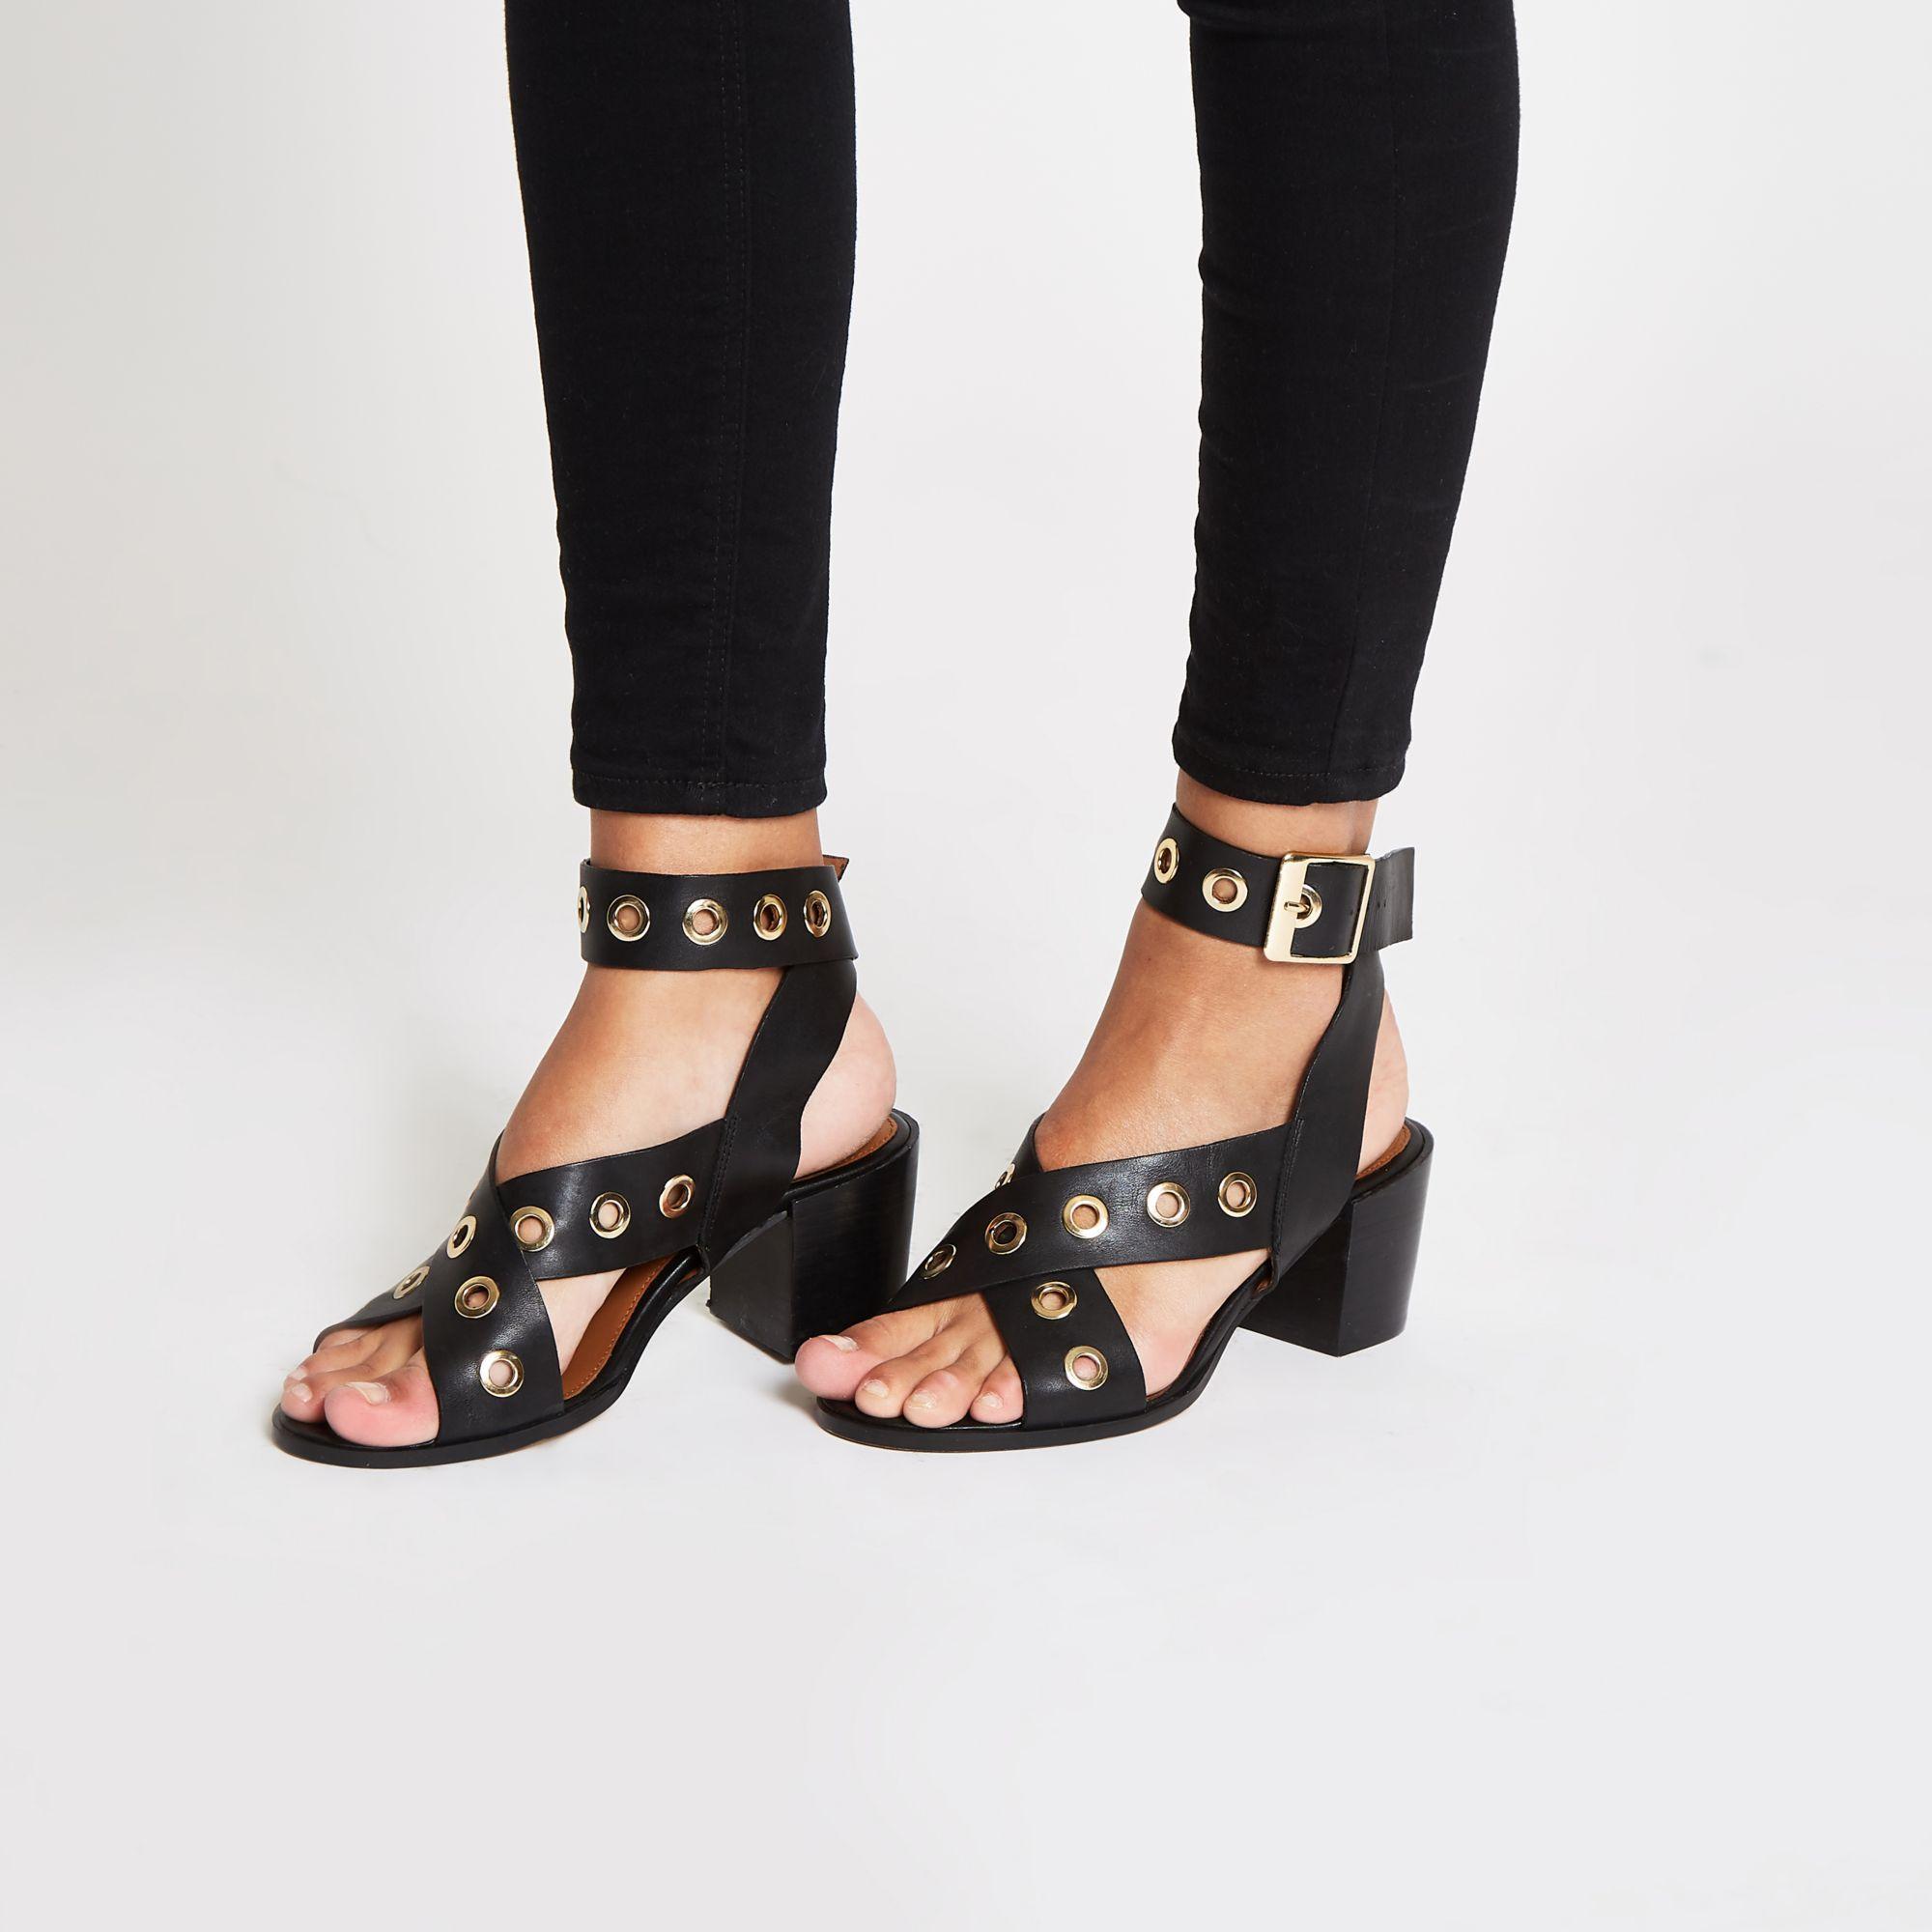 bc58d9158ca5 ... Black Leather Eyelet Block Heel Sandals - Lyst. View fullscreen